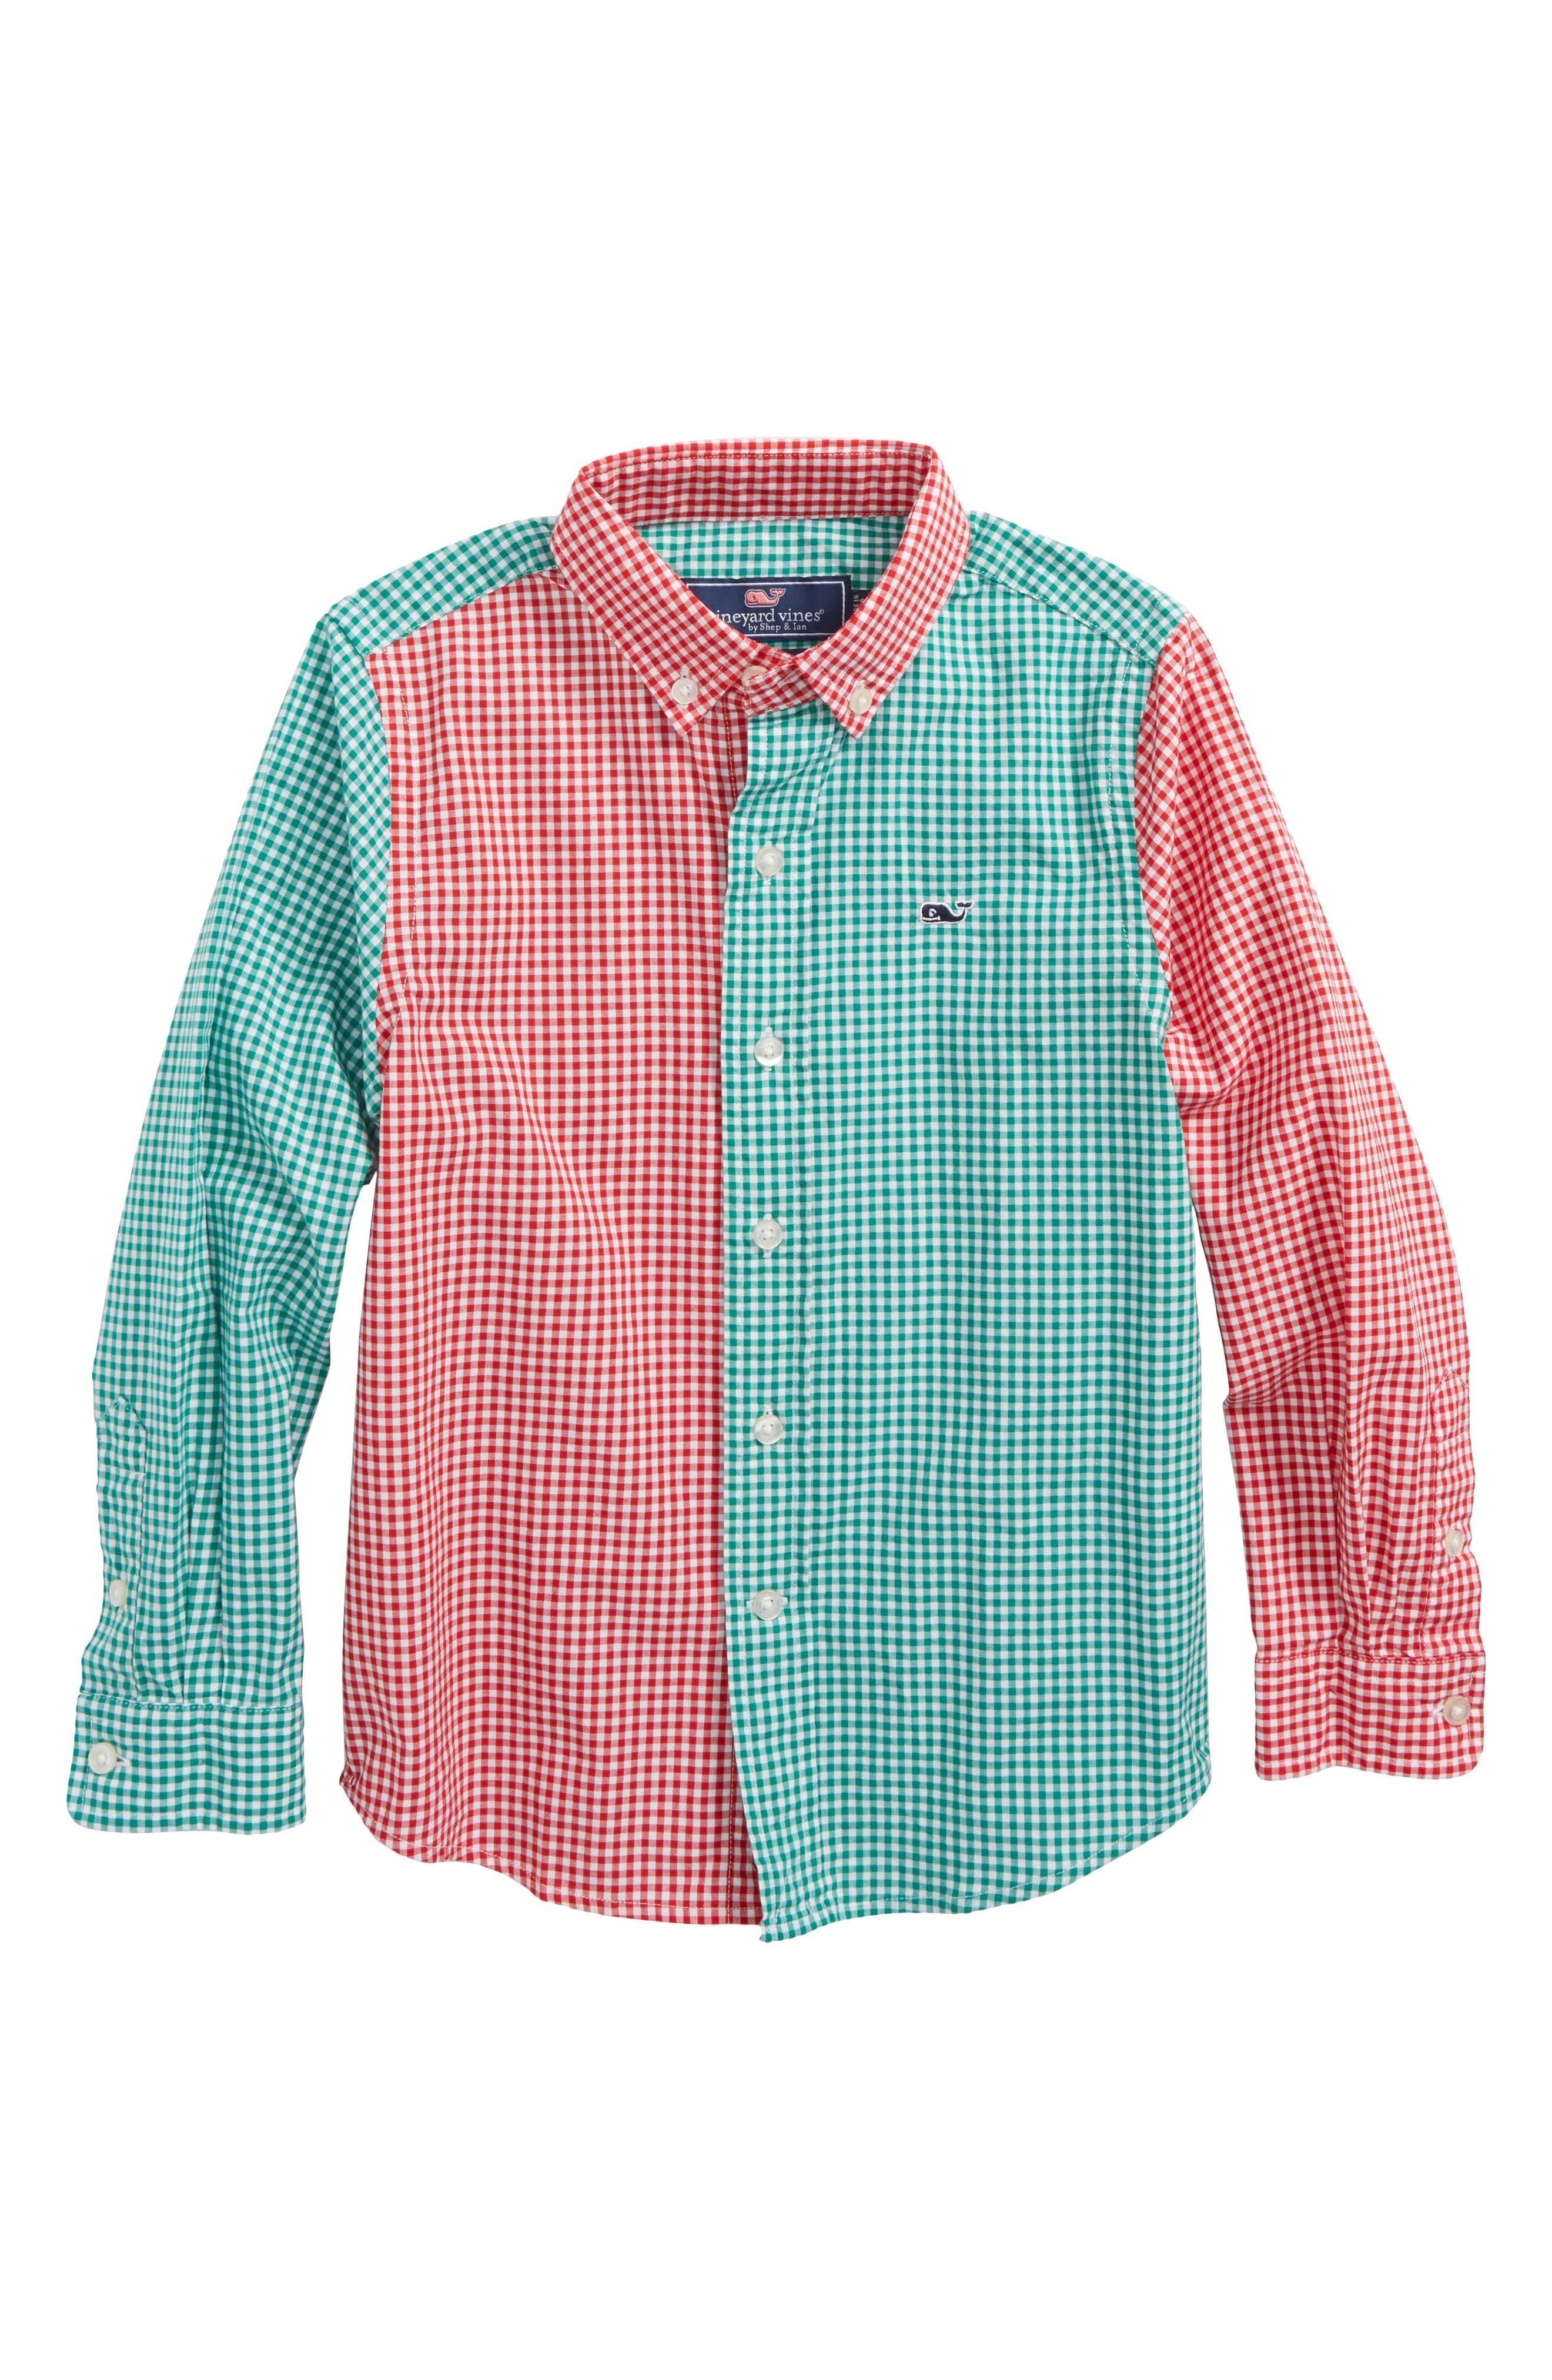 Party Gingham Plaid Shirt,                         Main,                         color, Multi